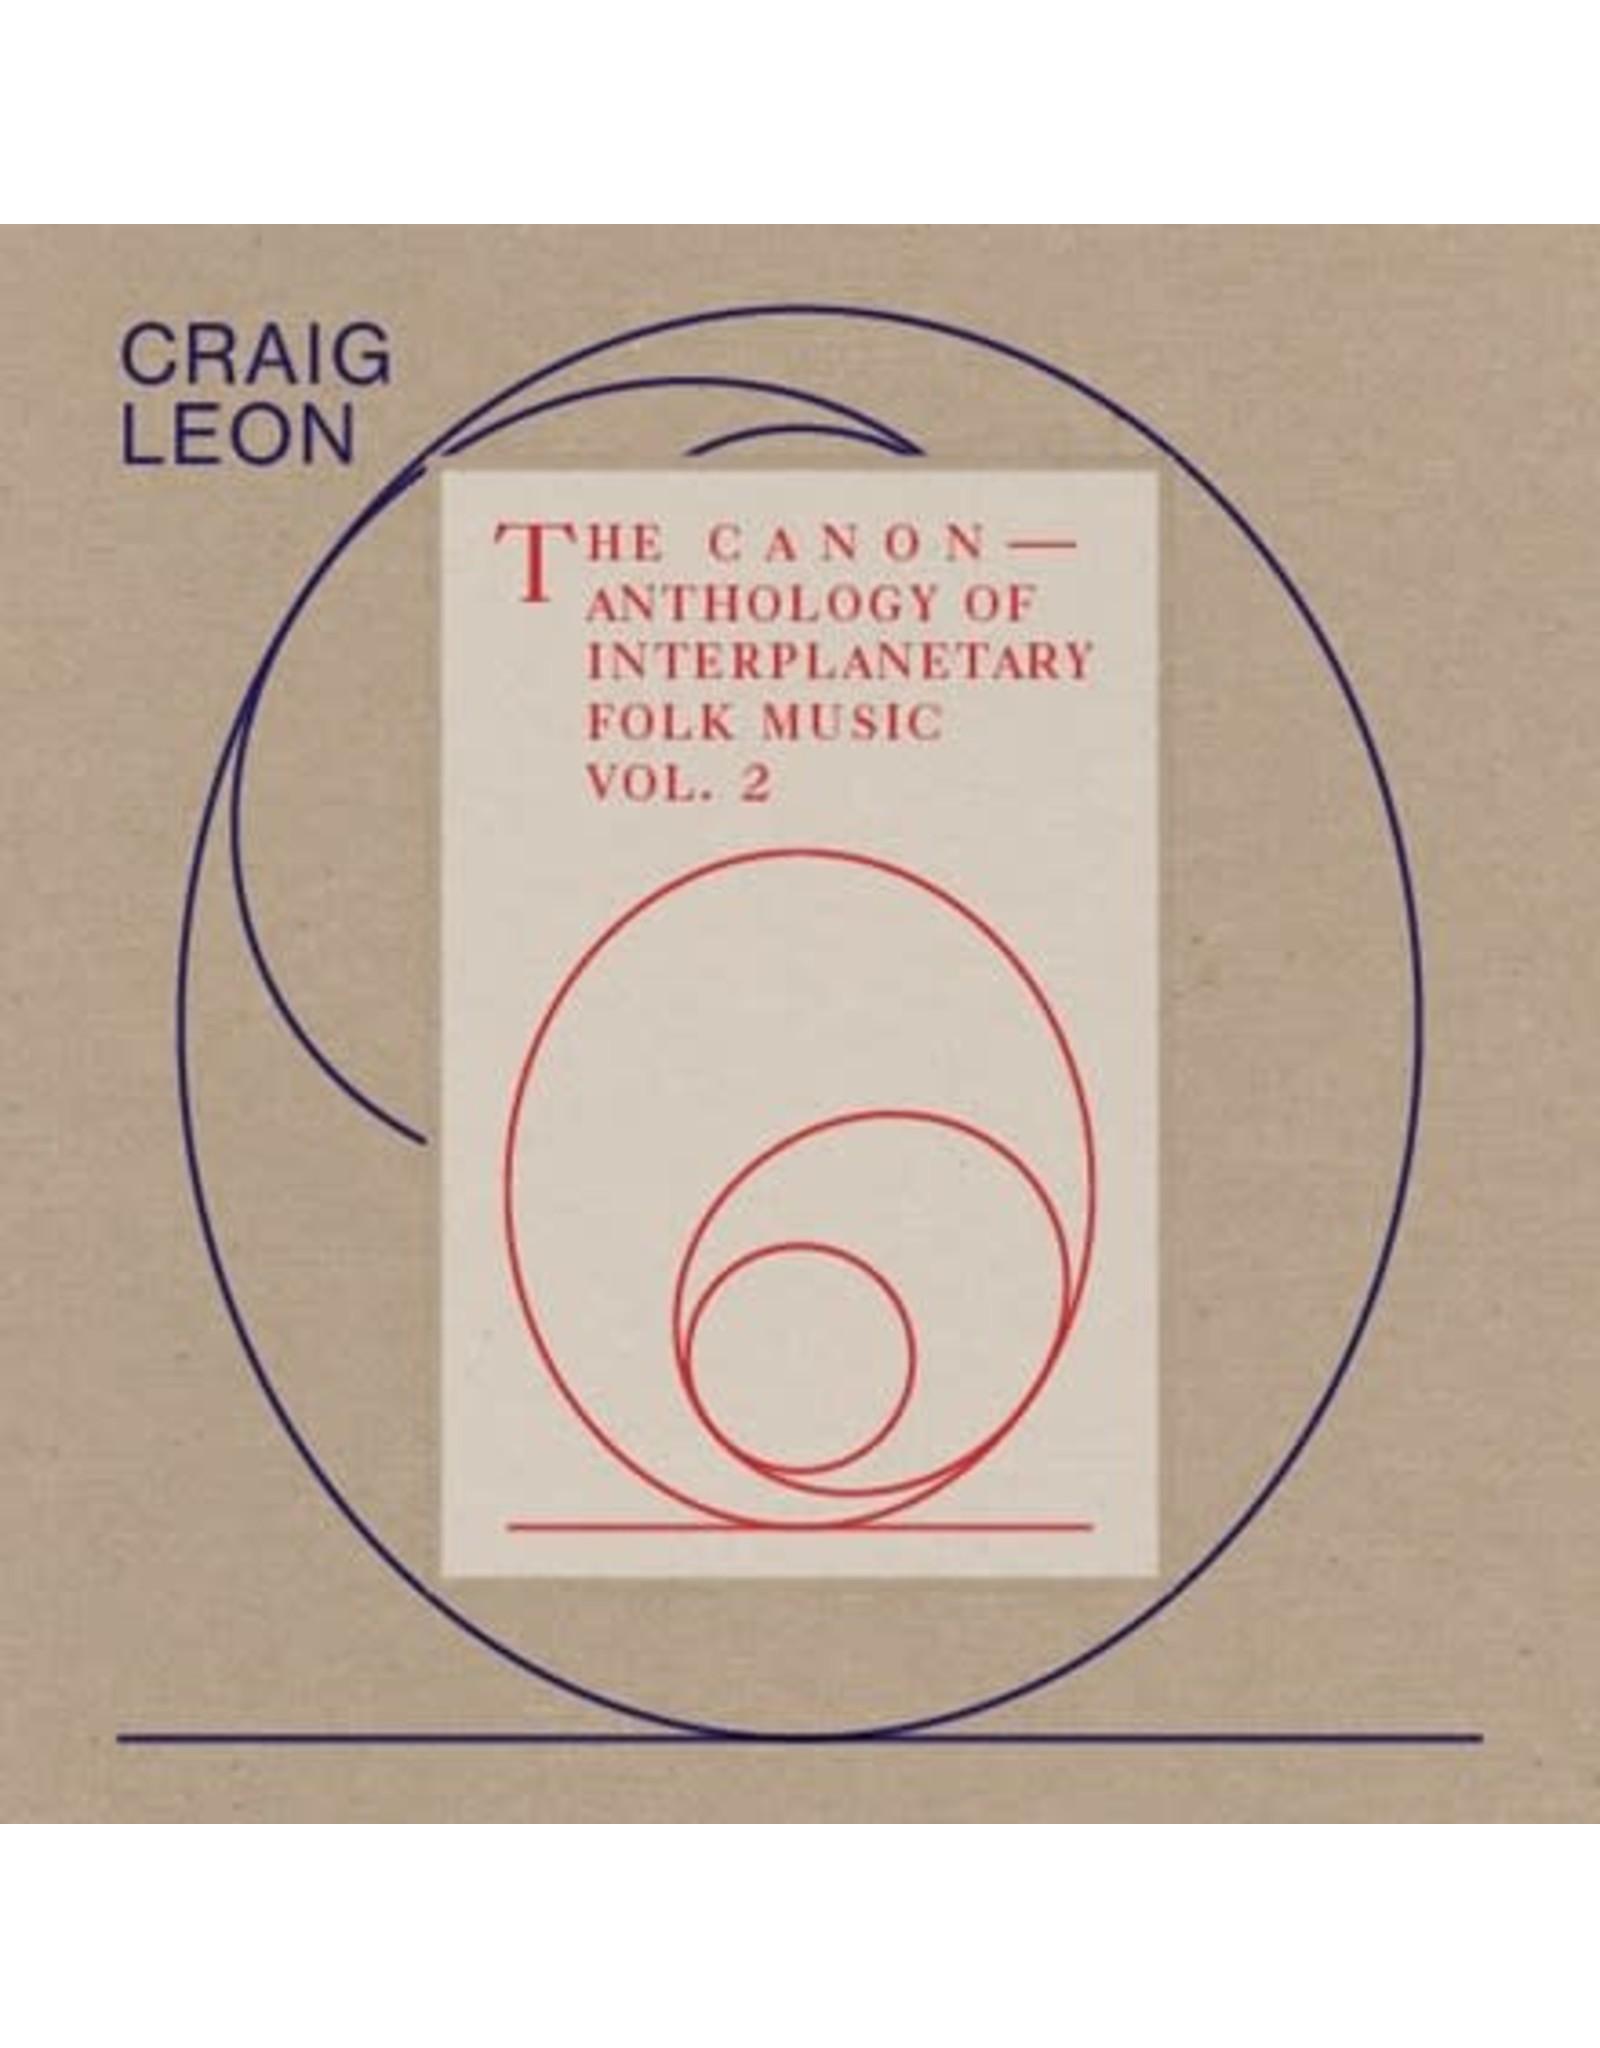 RVNG Intl. Leon, Craig: Anthology of Interplanetary Folk Music Vol. 2: The Canon LP